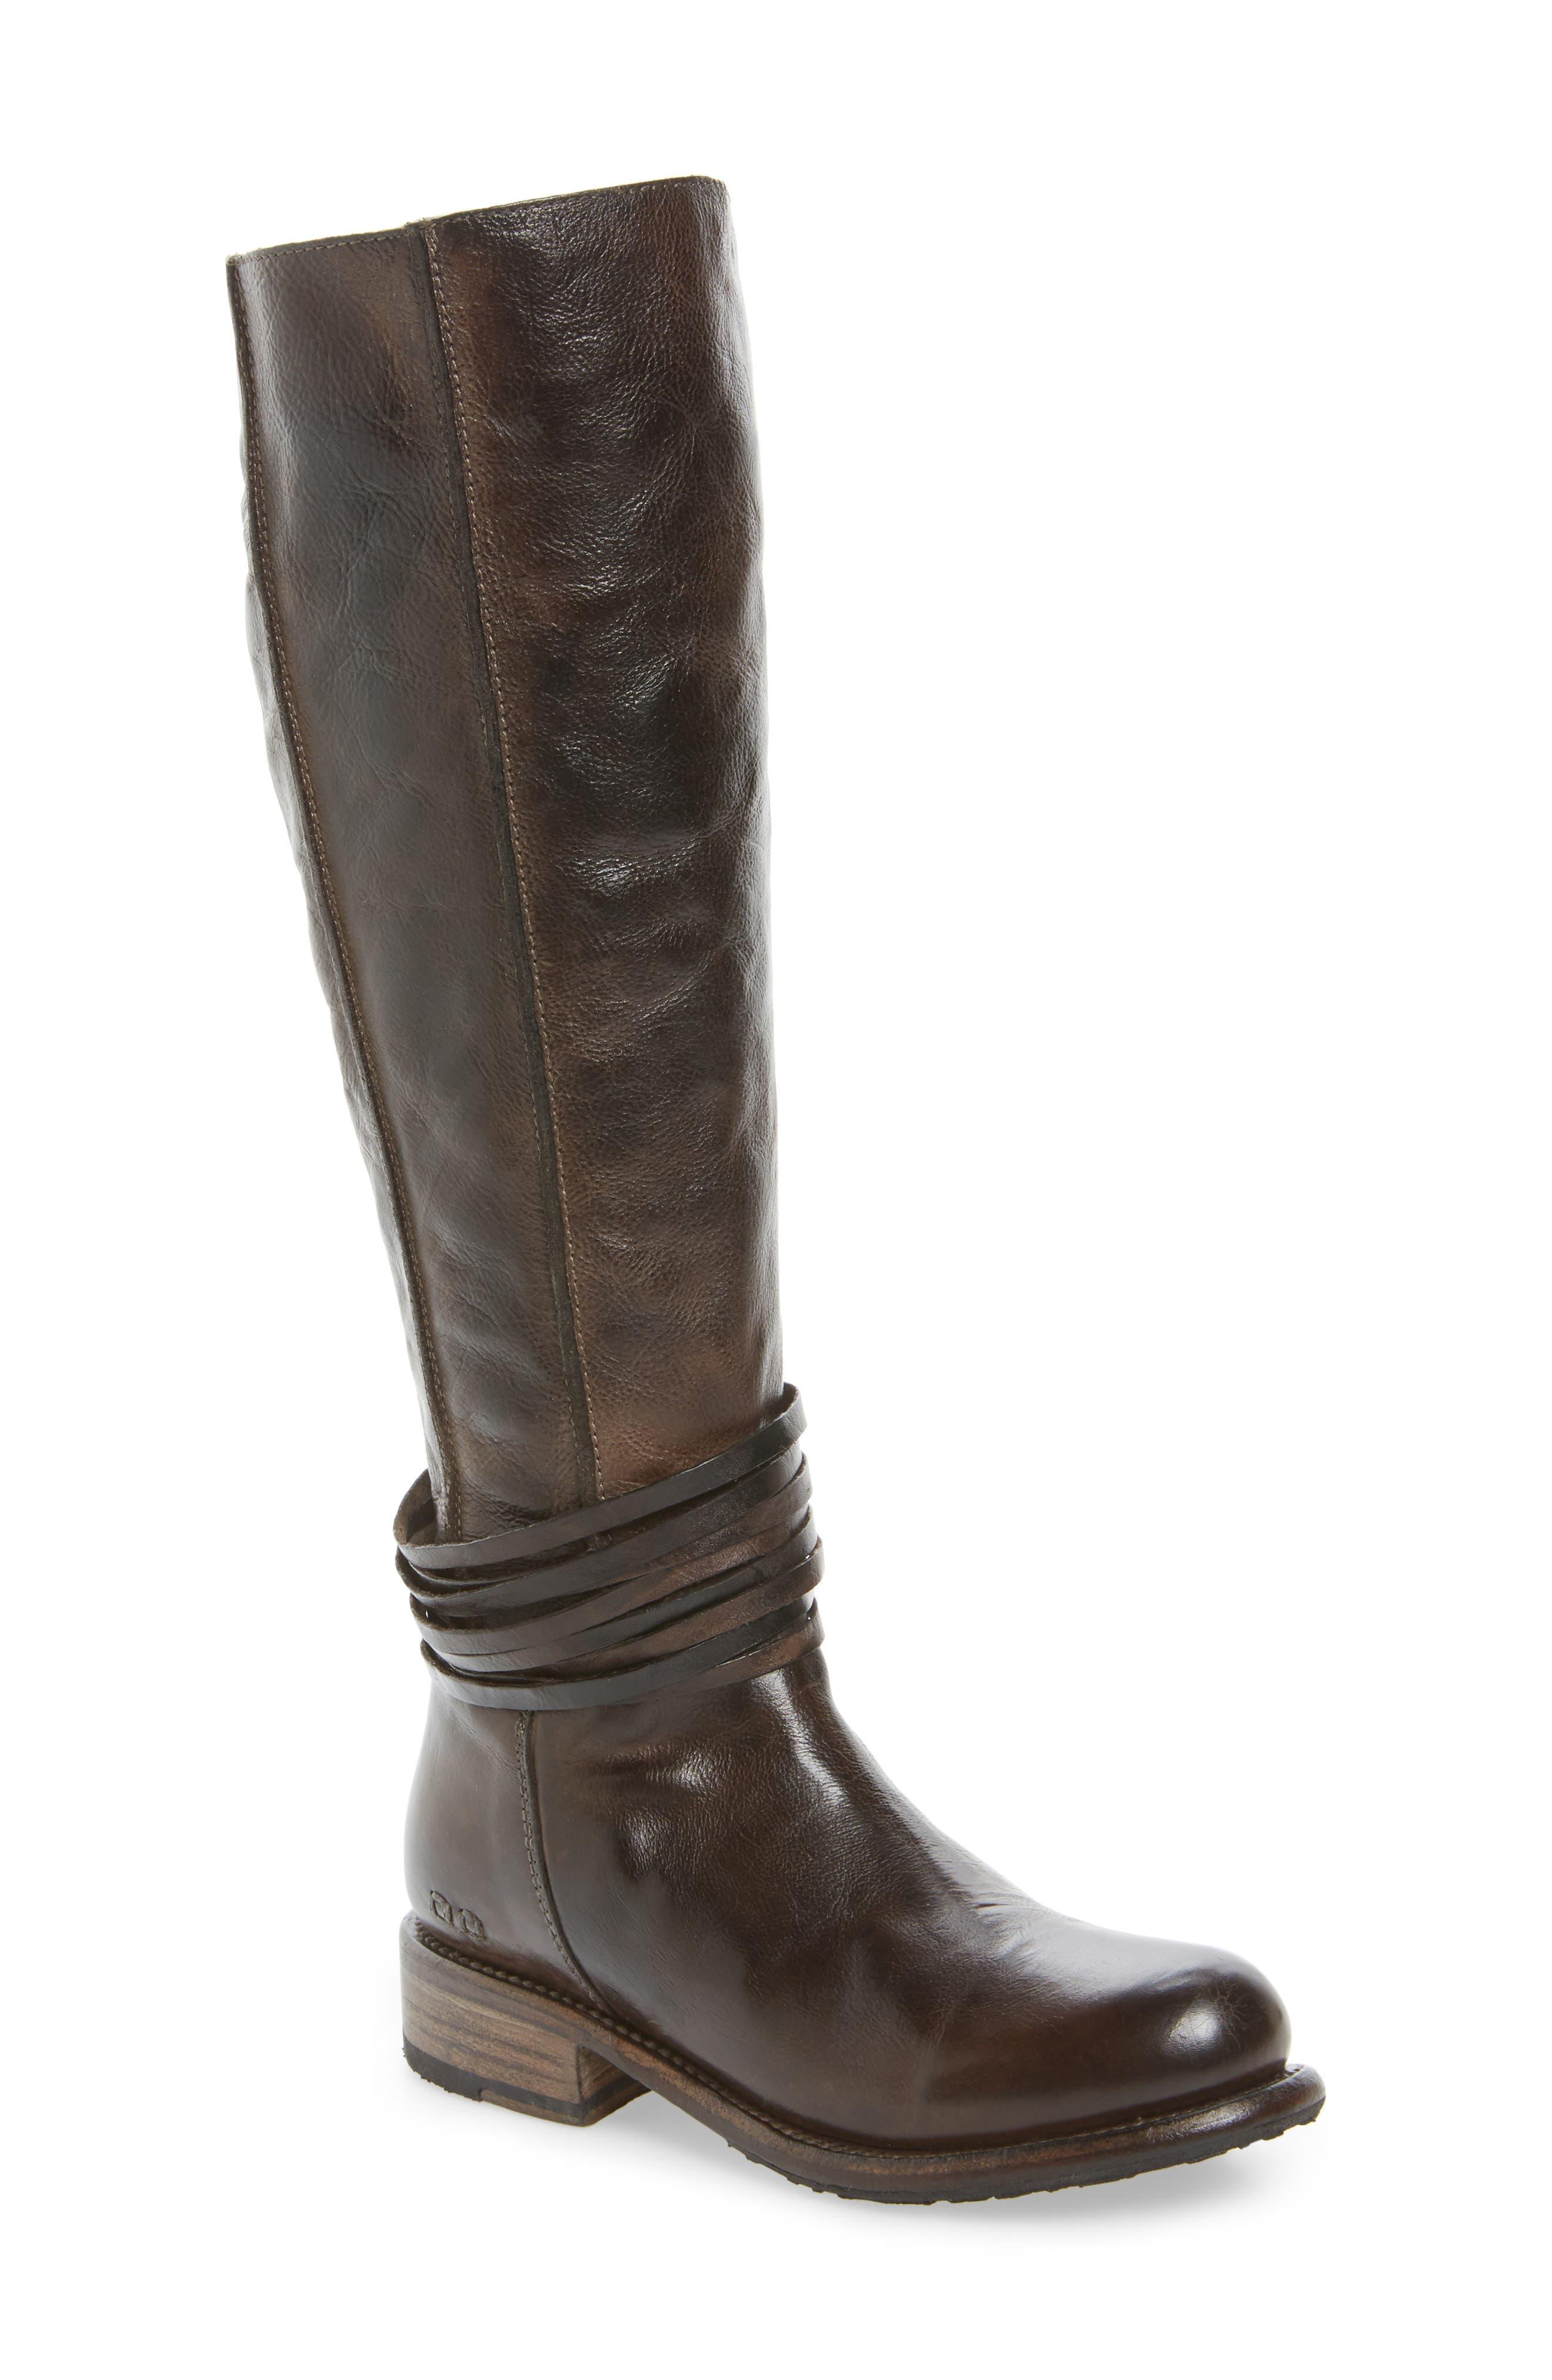 Weymouth Knee High Boot,                             Main thumbnail 1, color,                             200